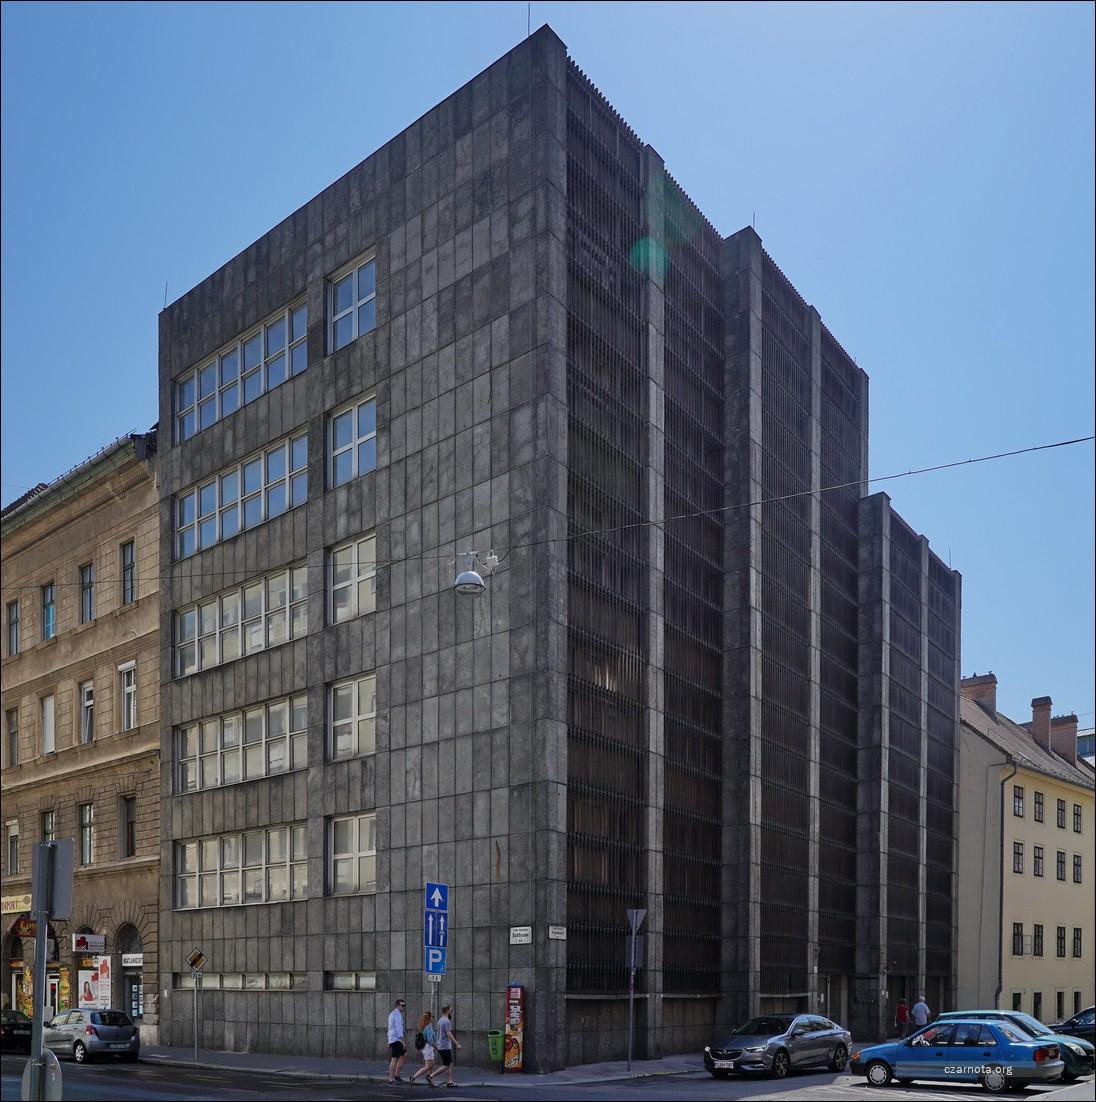 Hungary, Węgry, Budapest, Budapeszt, Gyorskocsi 5-7 u. OMIKK HQ